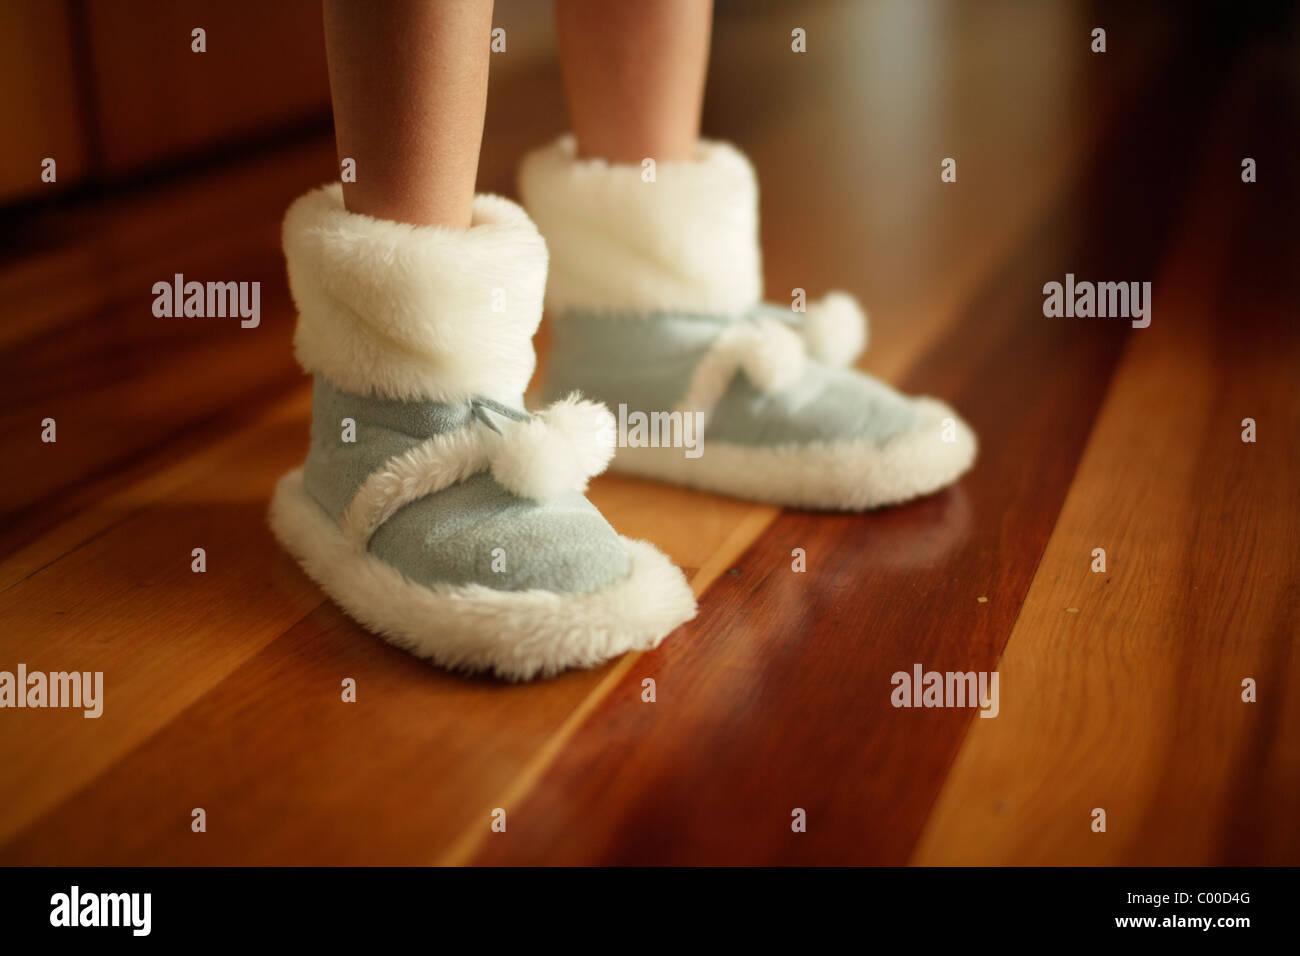 Chica caliente zapatillas sobre un piso de madera hecha de piel de borrego sintética Imagen De Stock